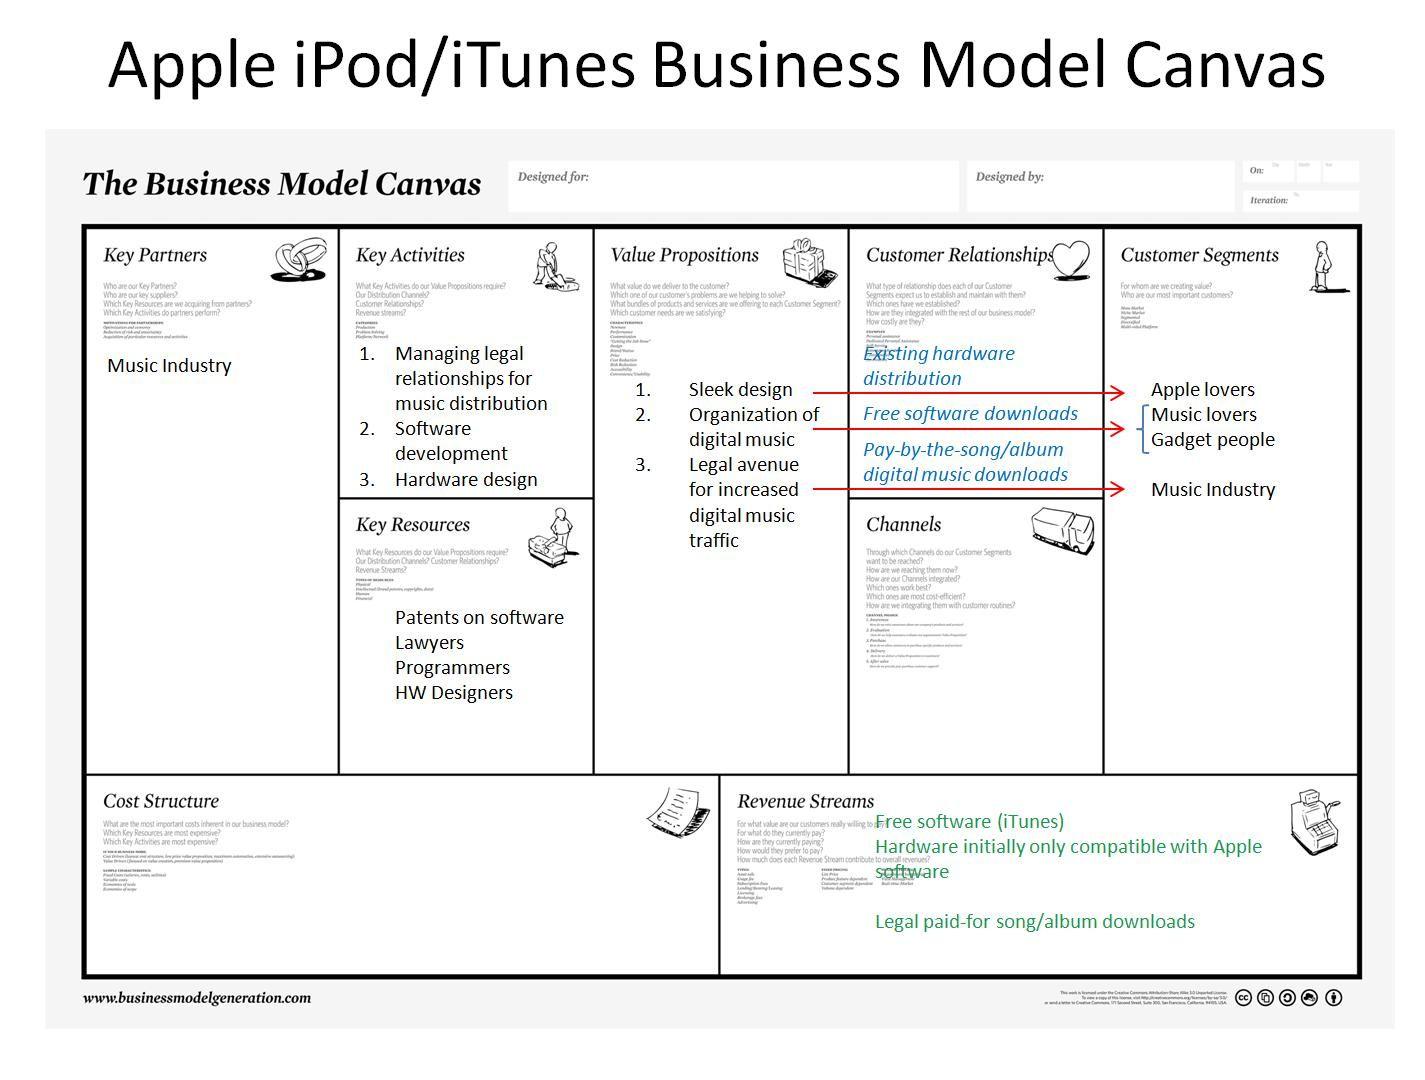 Business Model Canvas Apple iPod/iTunes Apples